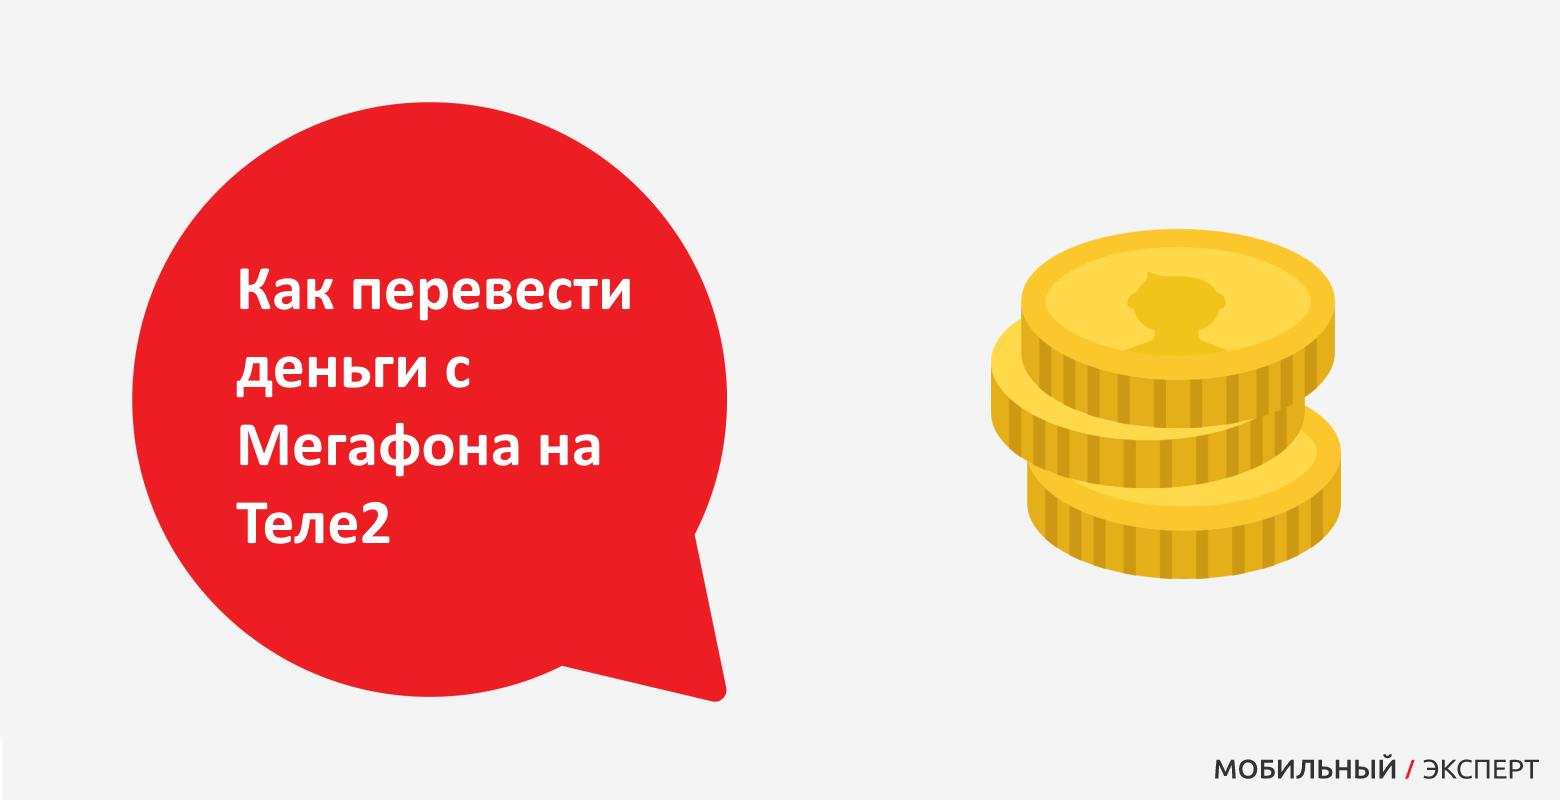 Перевод денег с Мегафона на Теле2м